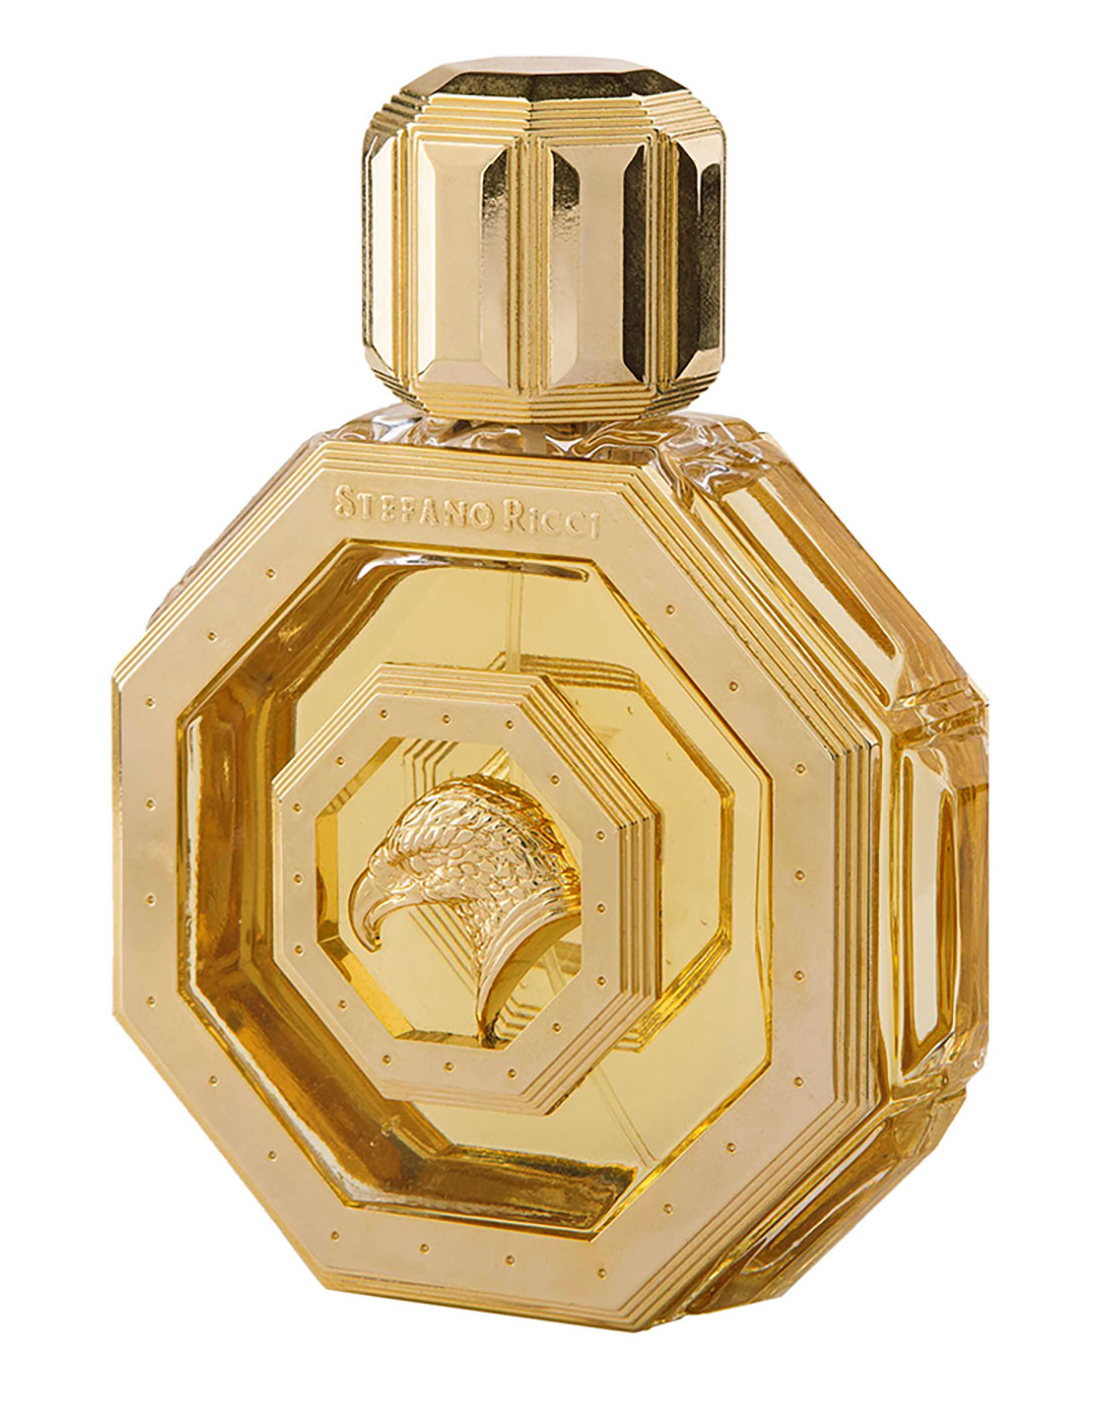 royal eagle gold stefano ricci cologne ein es parfum f r m nner. Black Bedroom Furniture Sets. Home Design Ideas